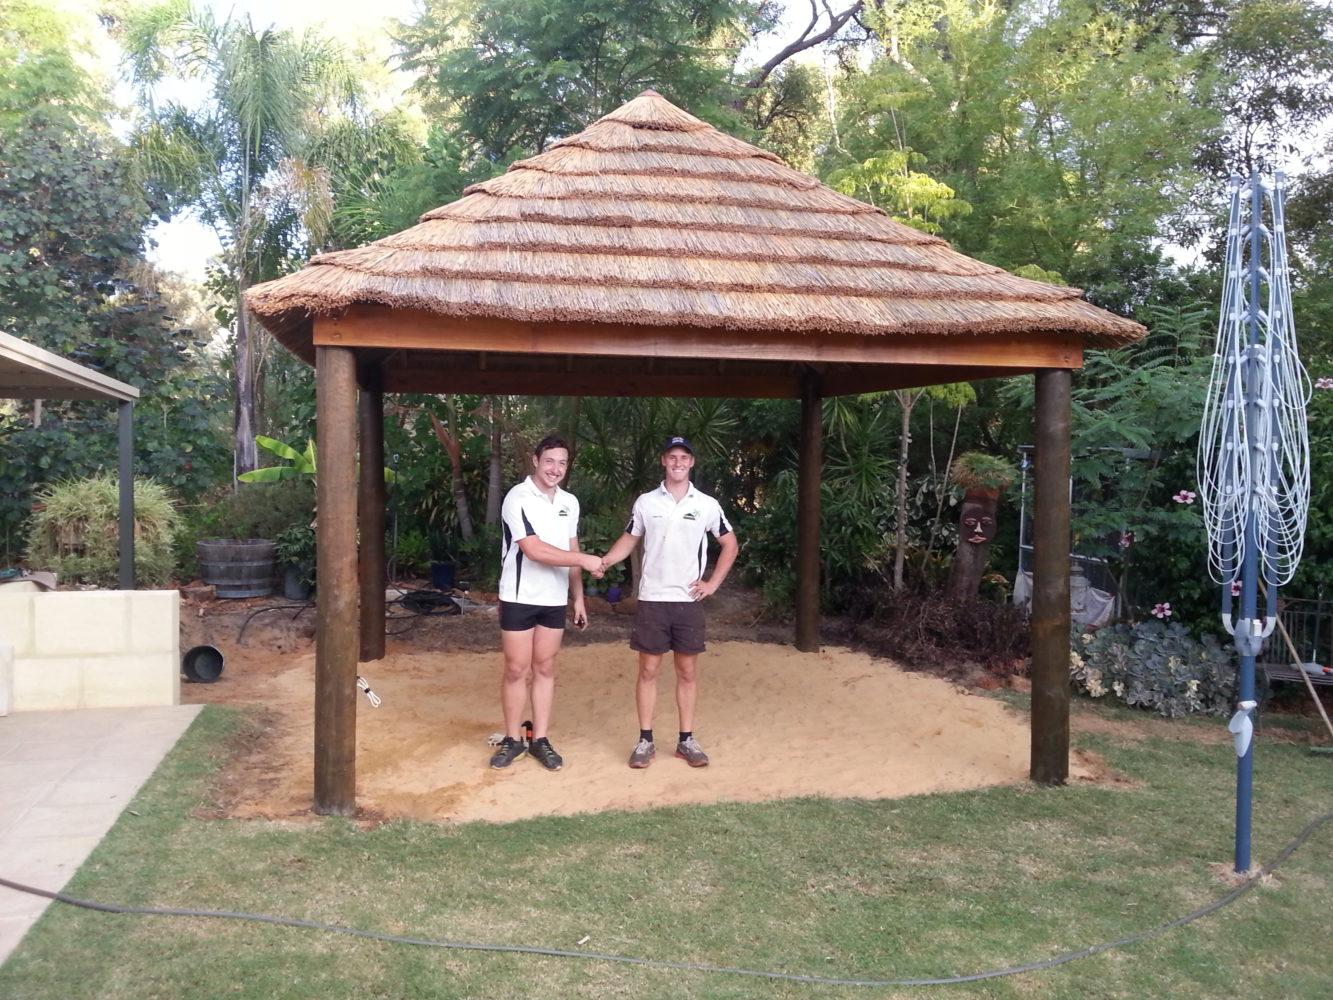 African Hut 4m x 4m